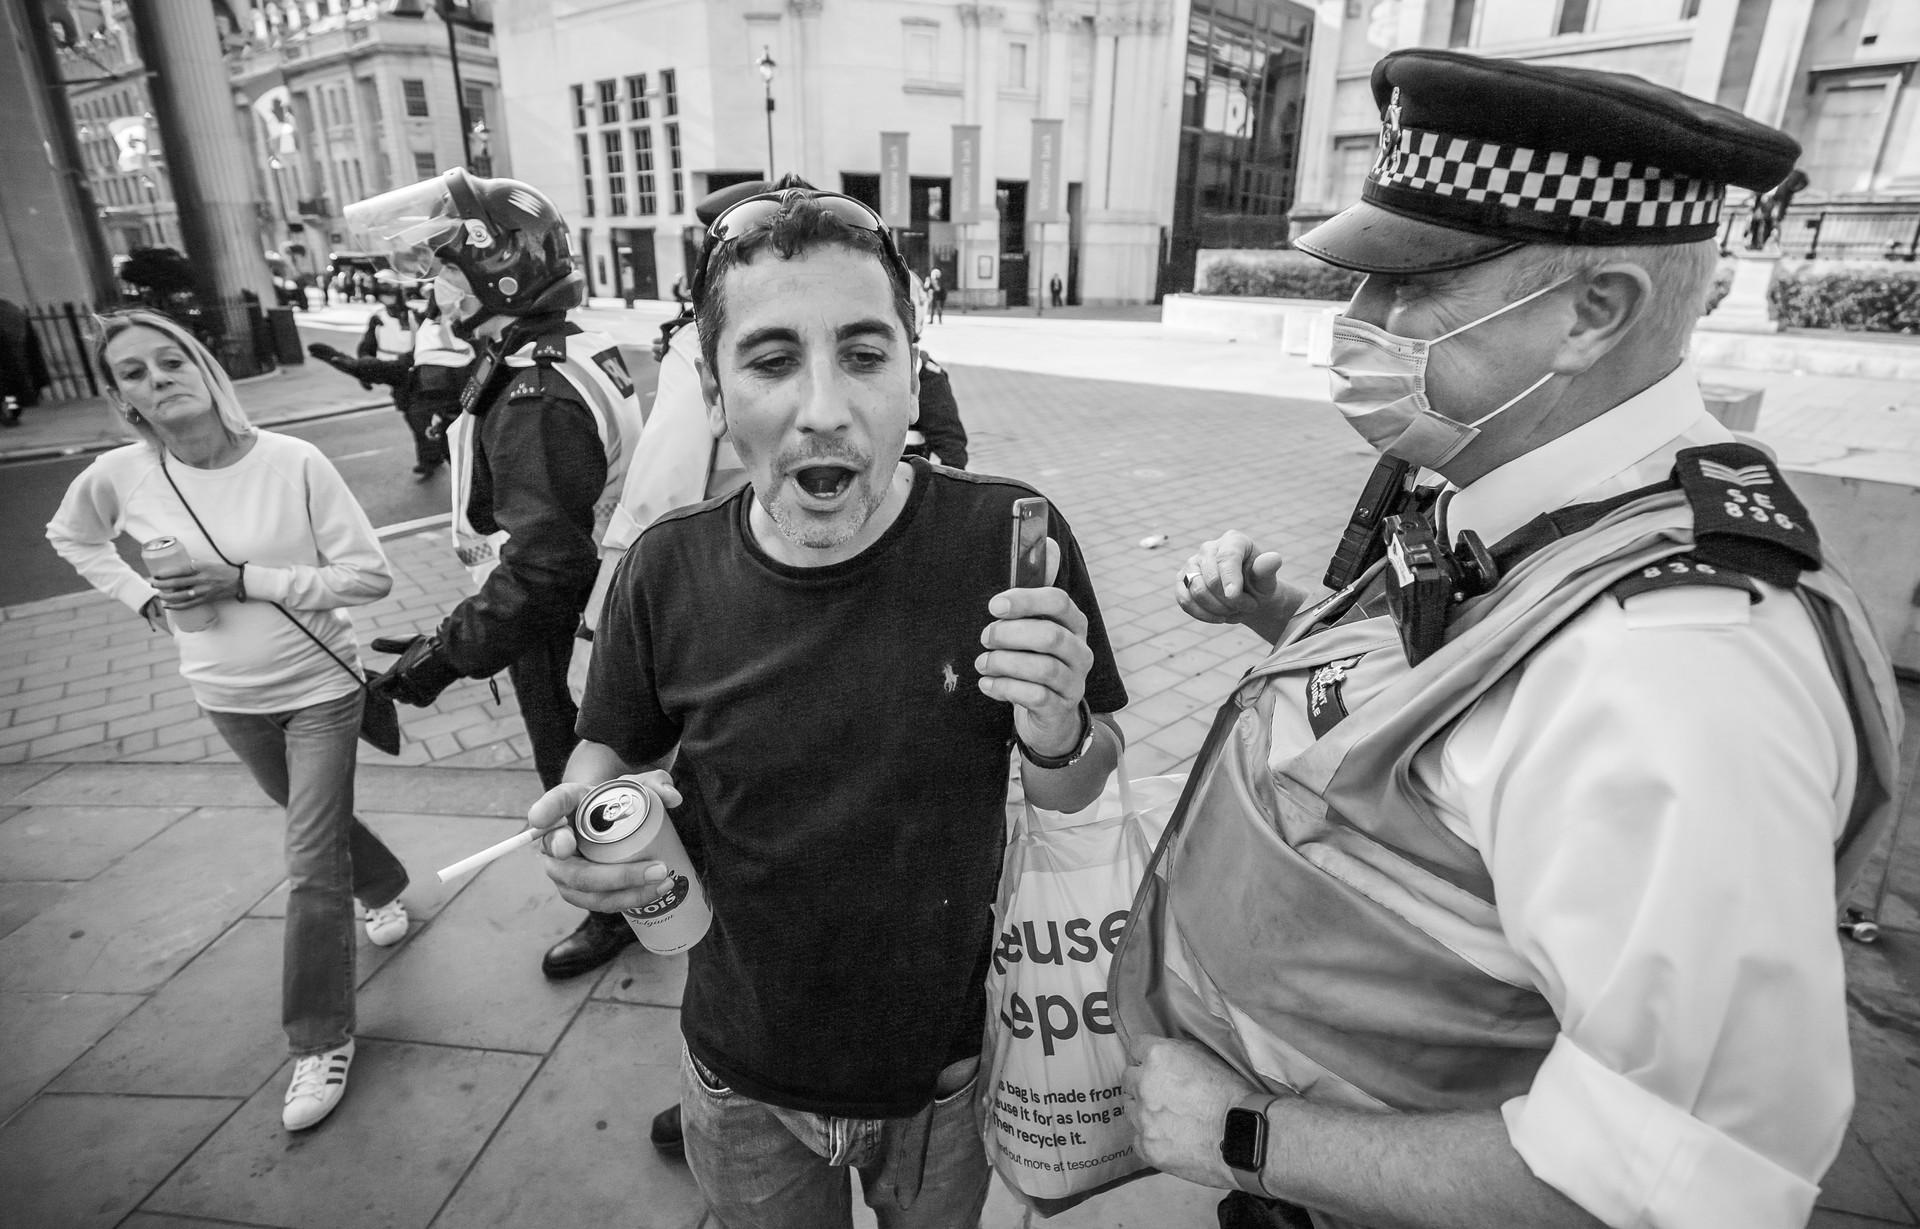 No i'm not drinking in public officer